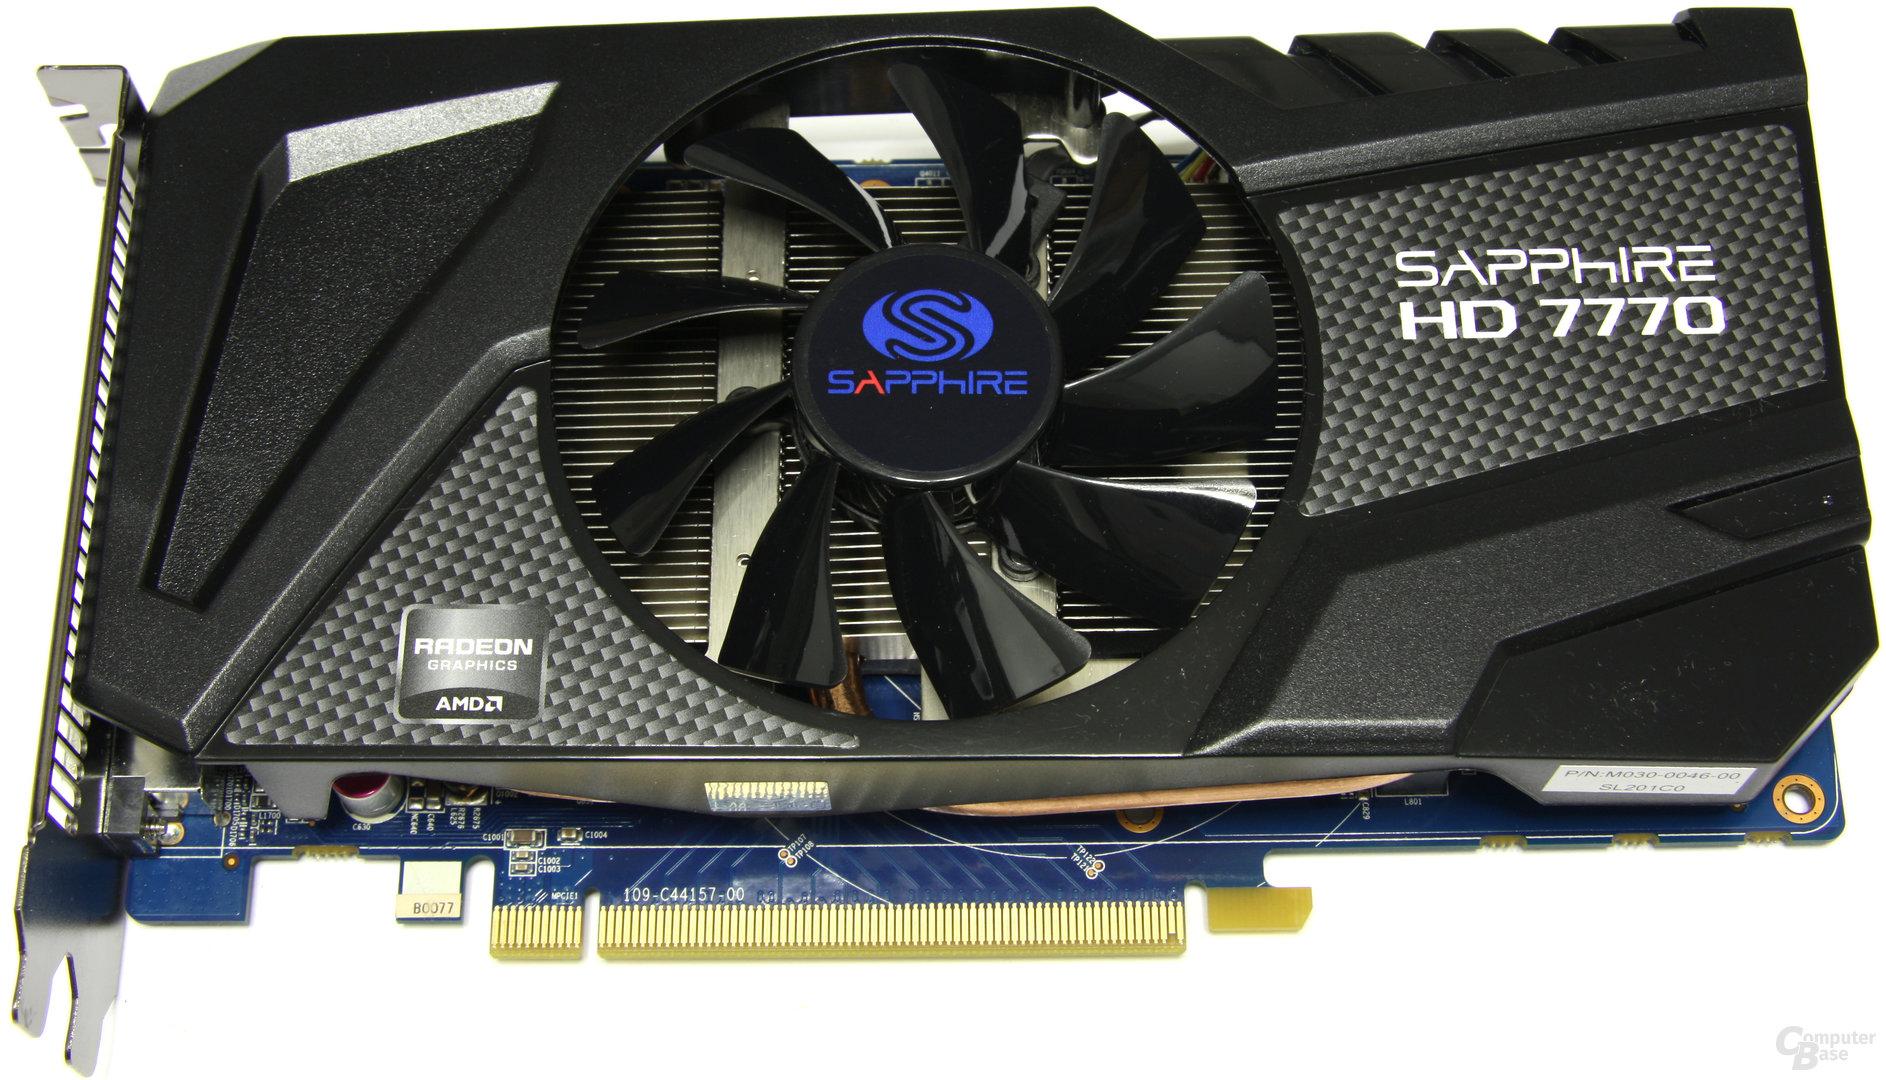 Sapphire Radeon HD 7770 OC